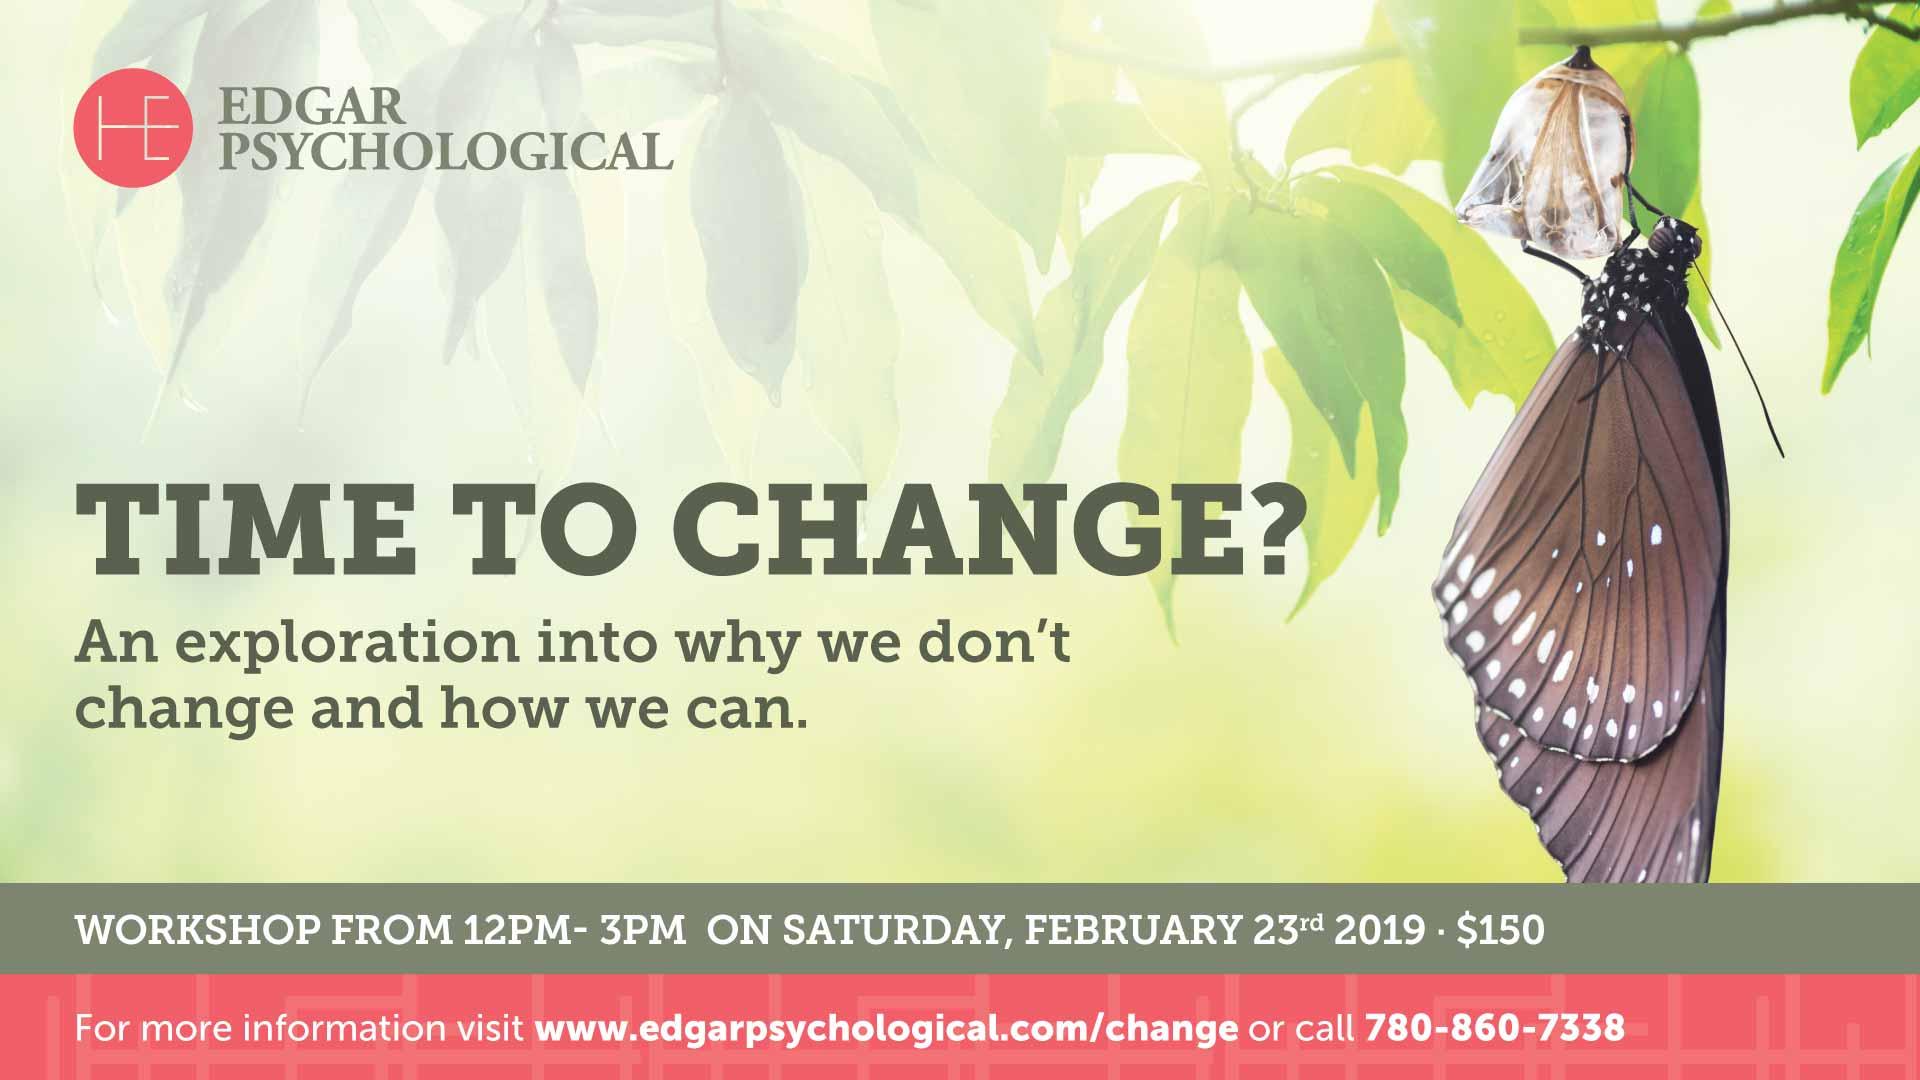 EP_time-to-change_social_20190121.jpg